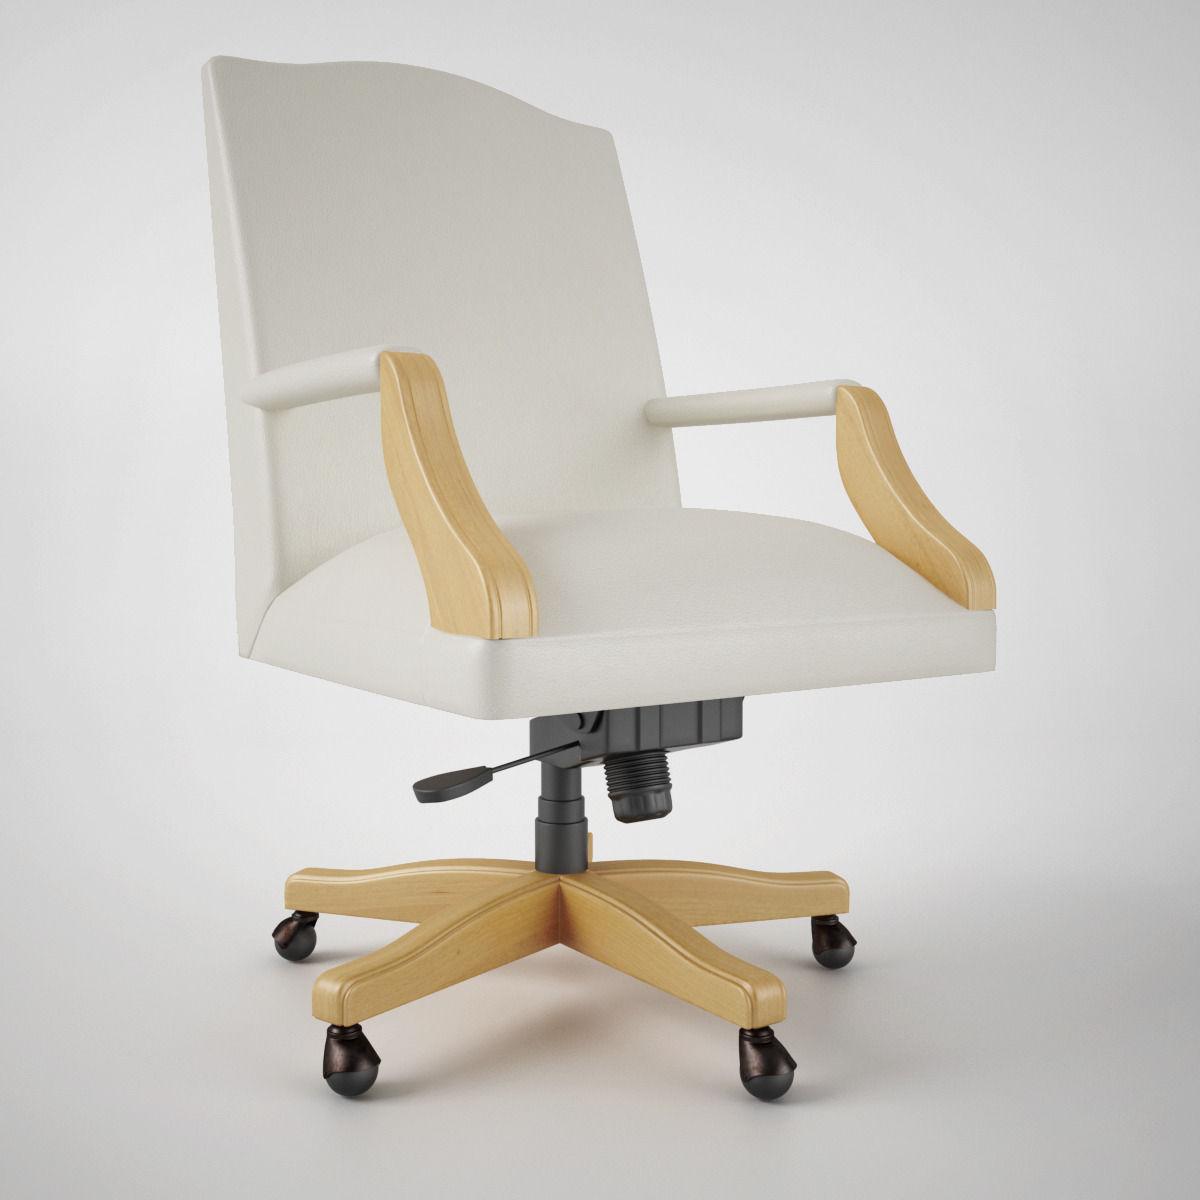 steelcase mansfield office chair 3d model max obj fbx mtl 2